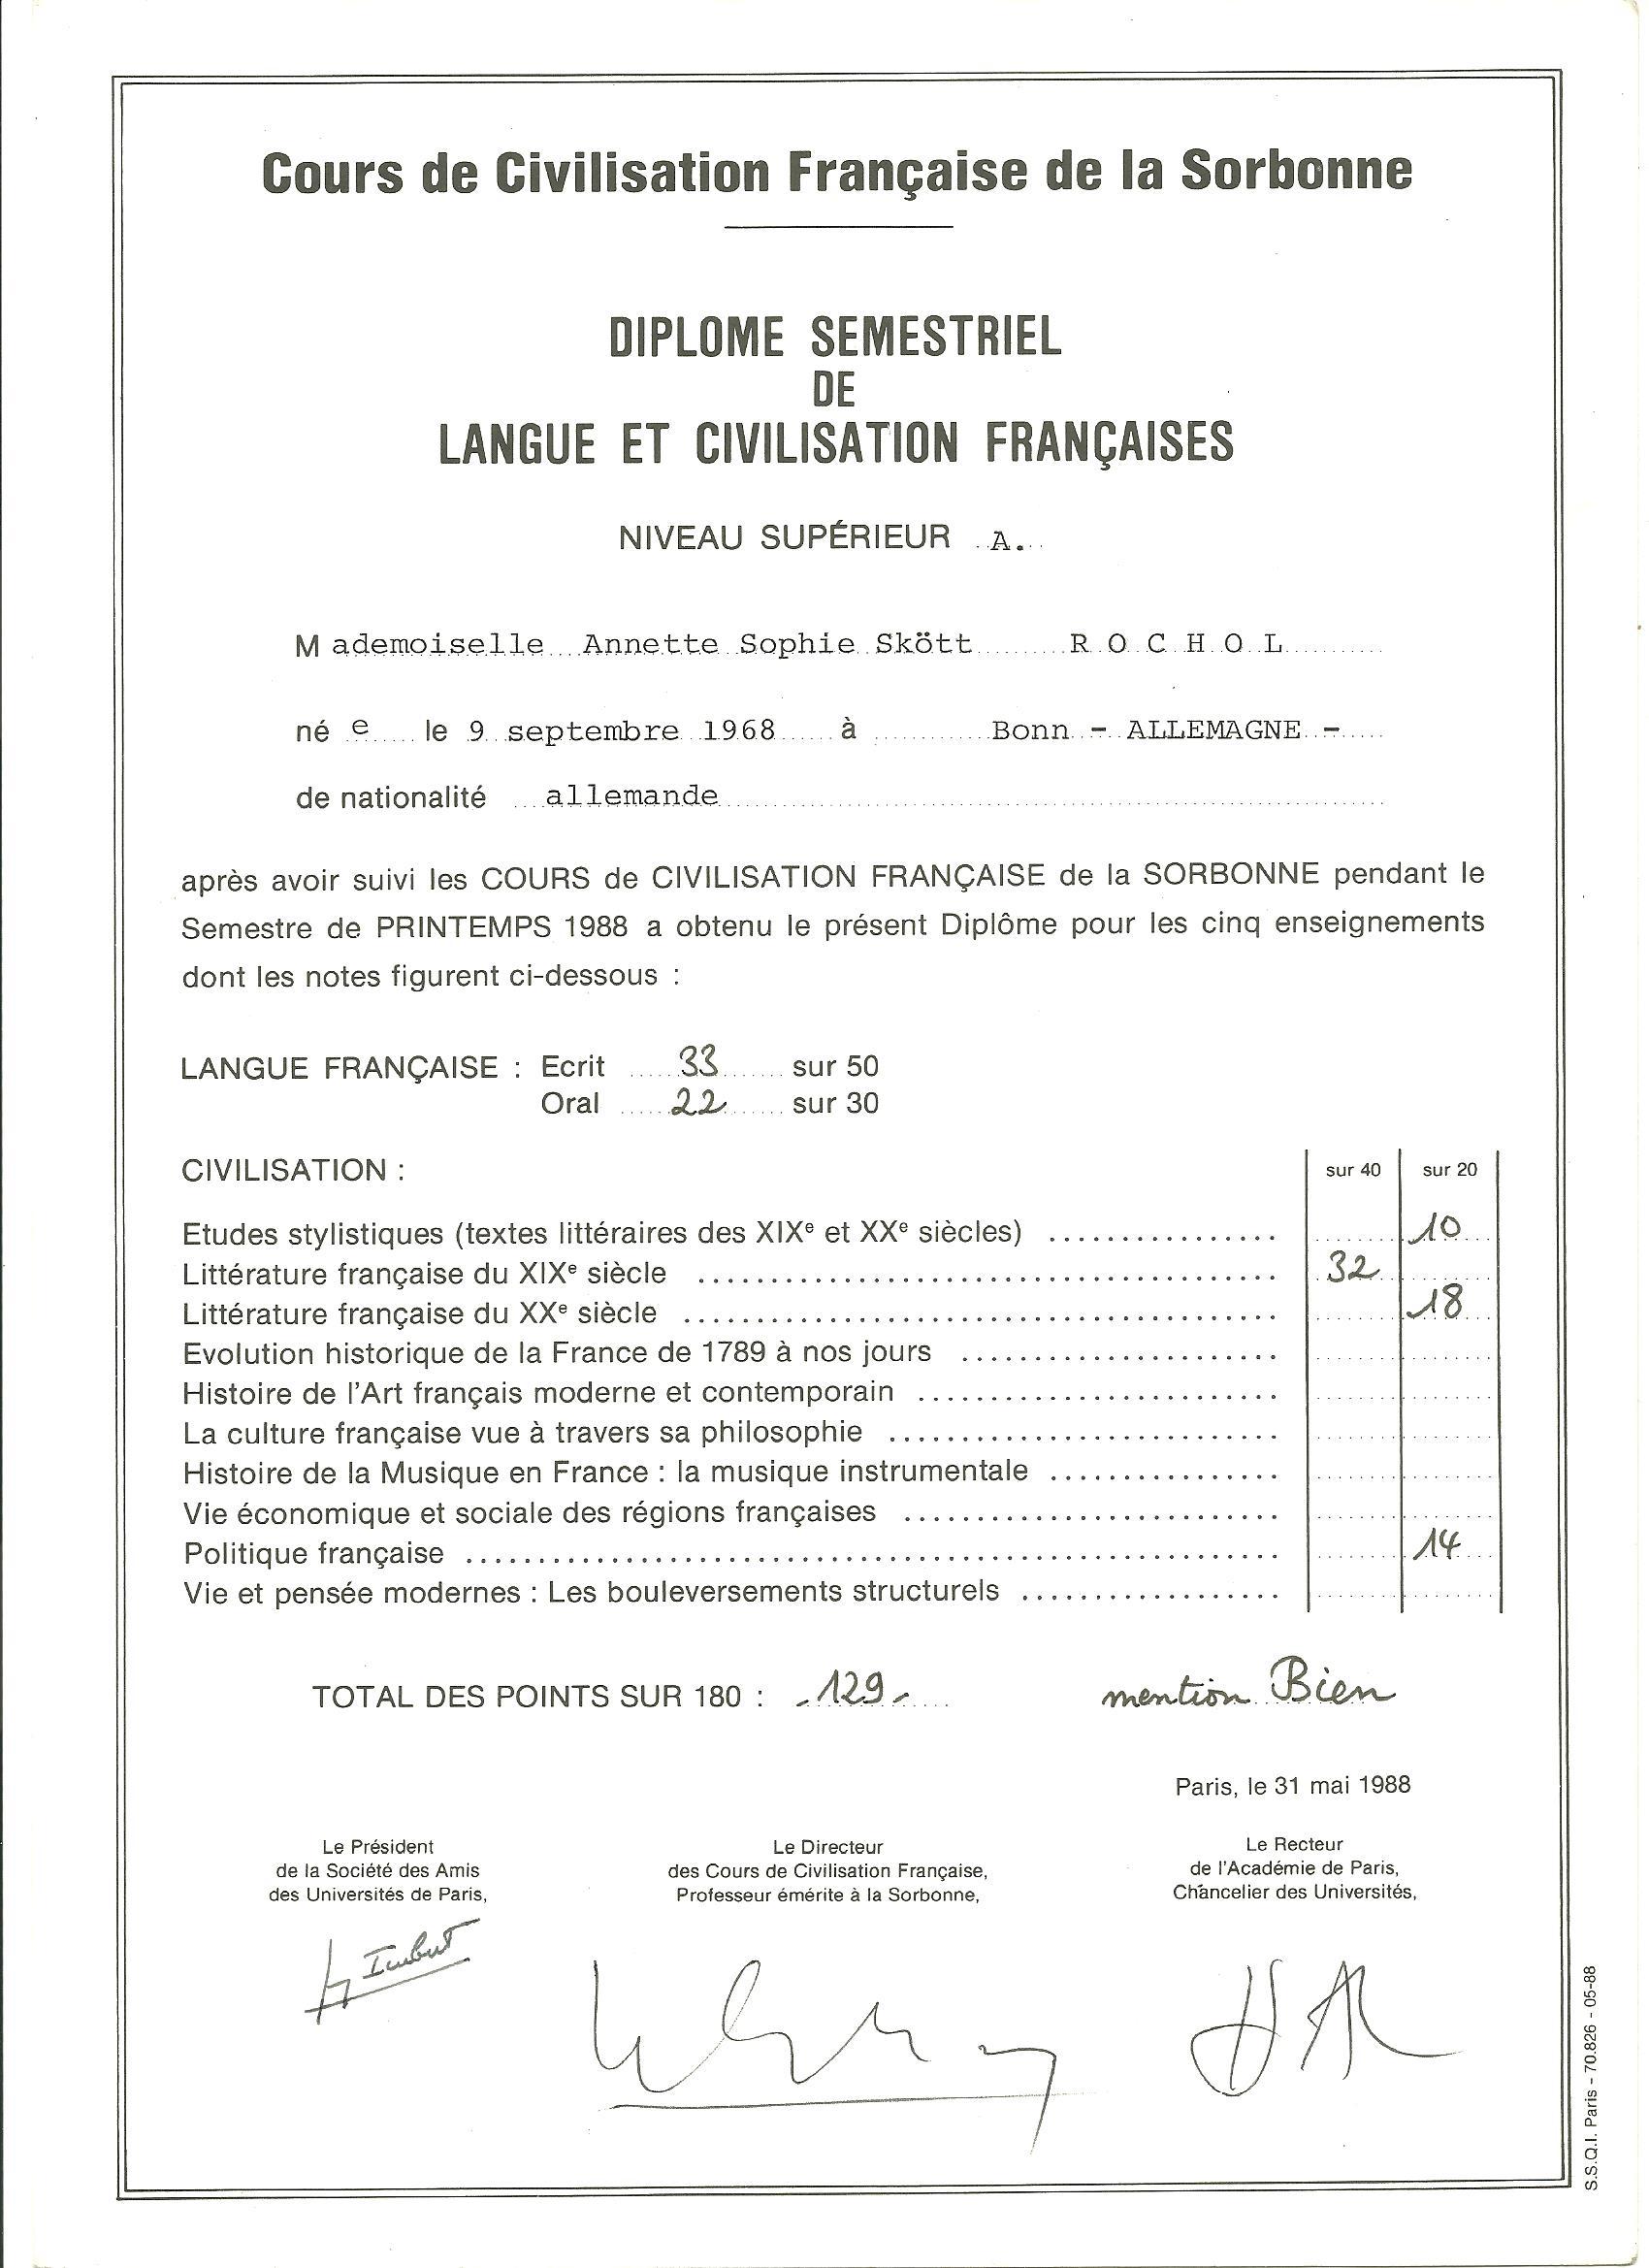 1988  u2019  certificat    u2019  deutsche  u00dcbersetzung